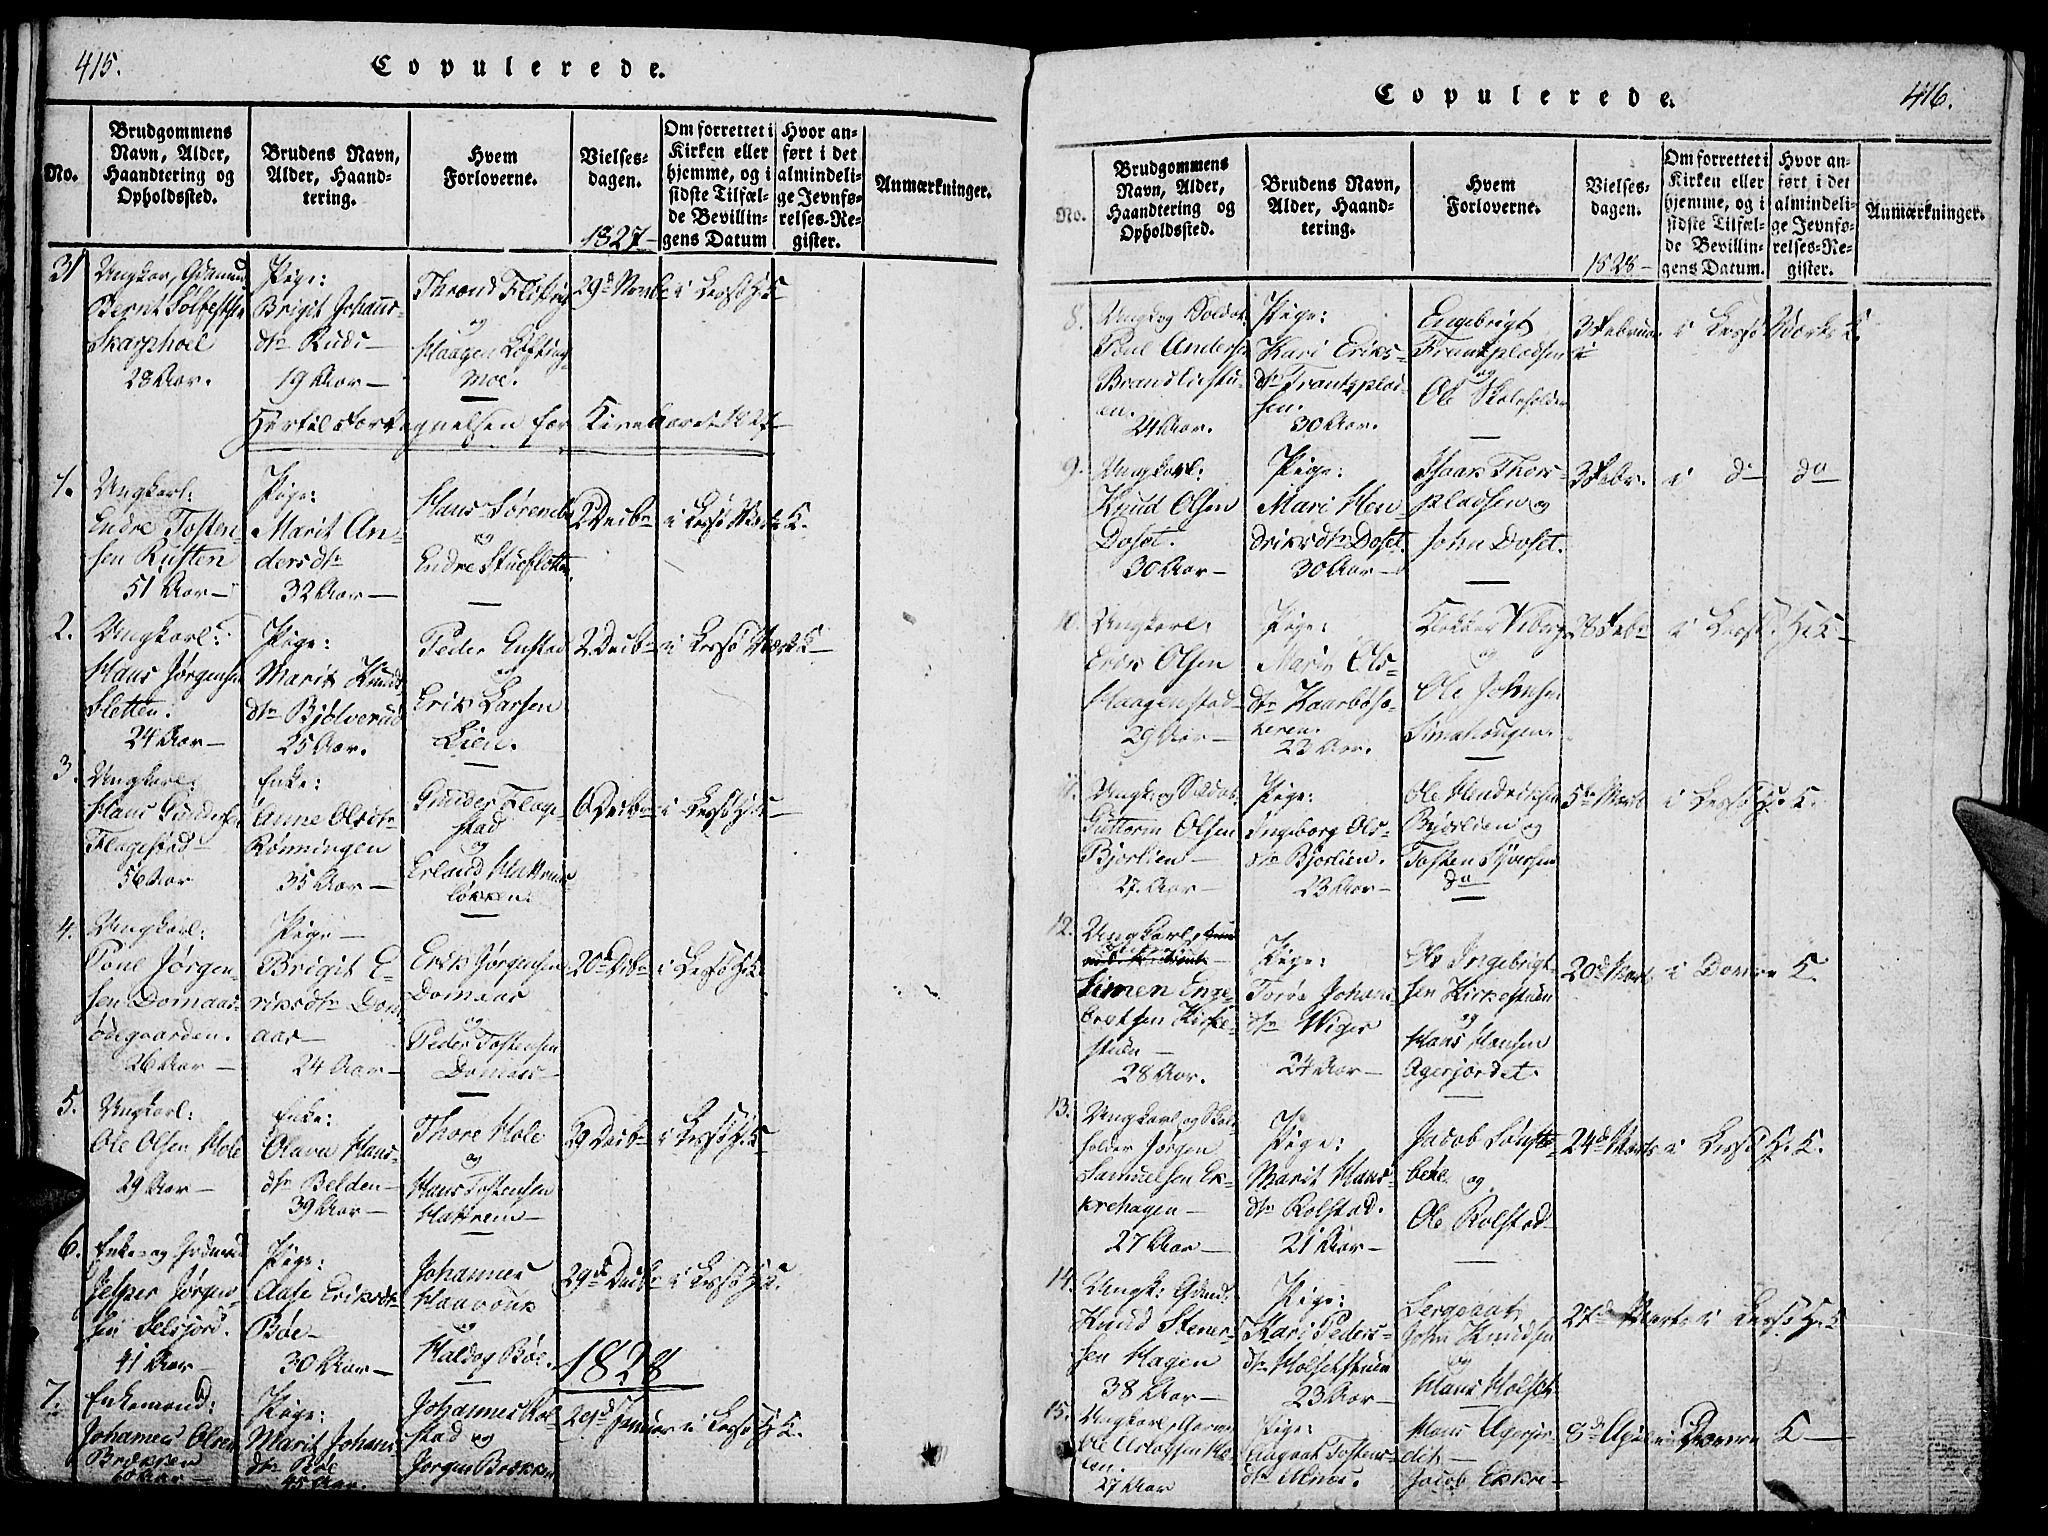 SAH, Lesja prestekontor, Ministerialbok nr. 4, 1820-1829, s. 415-416